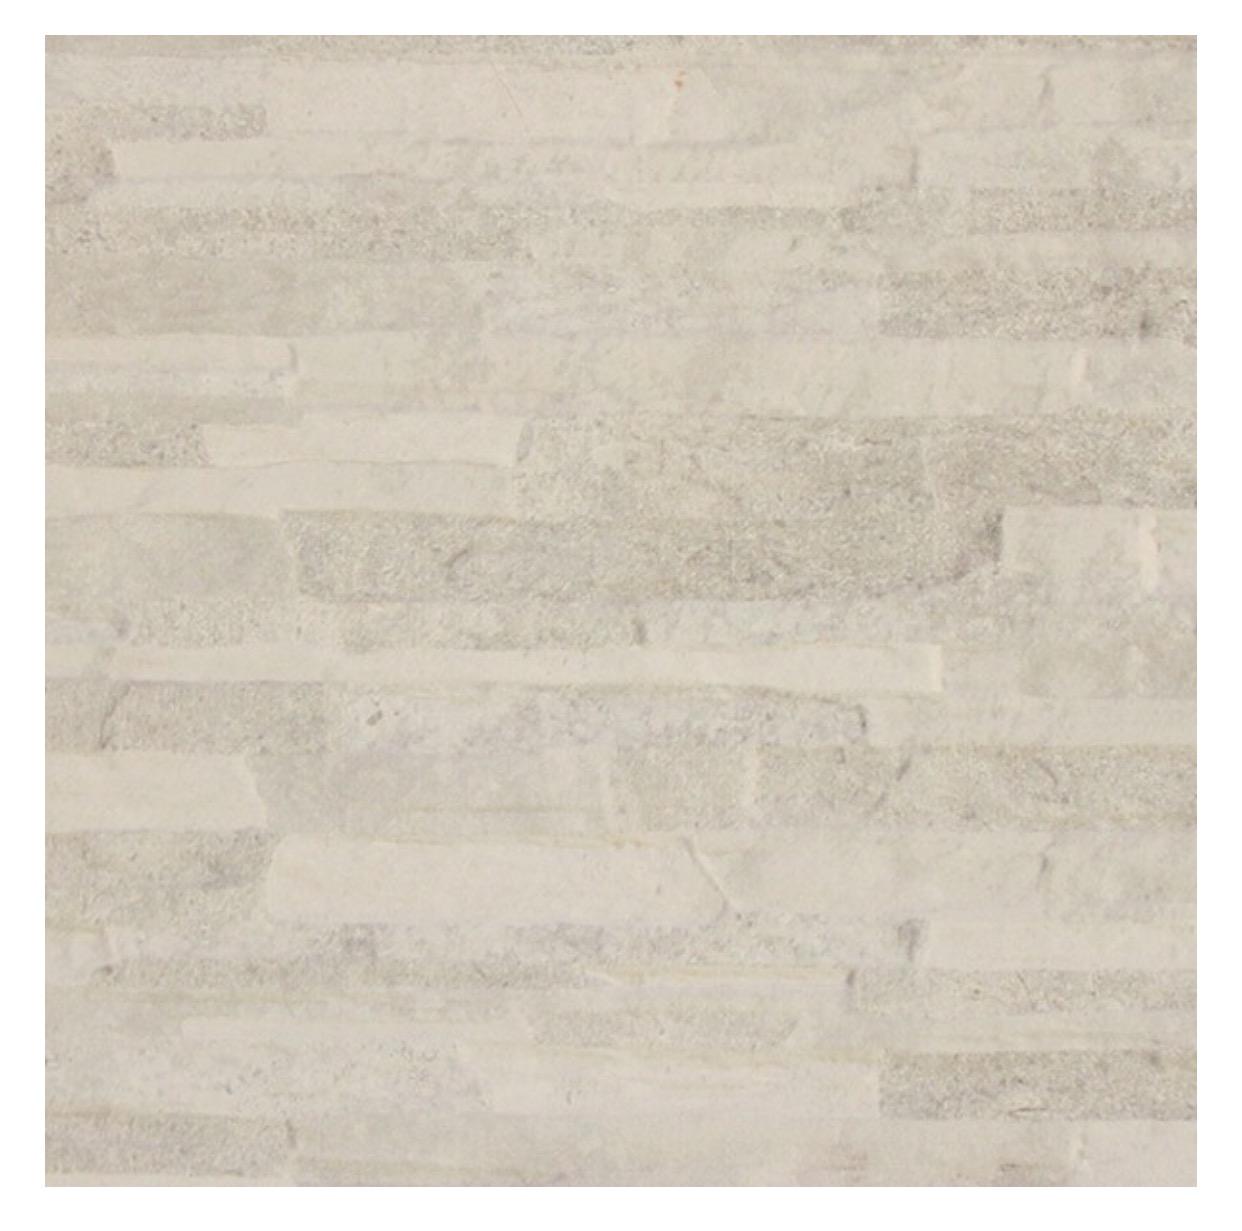 London Am London Brick Grey 257mm X 515mm The Cornwall Tile Company